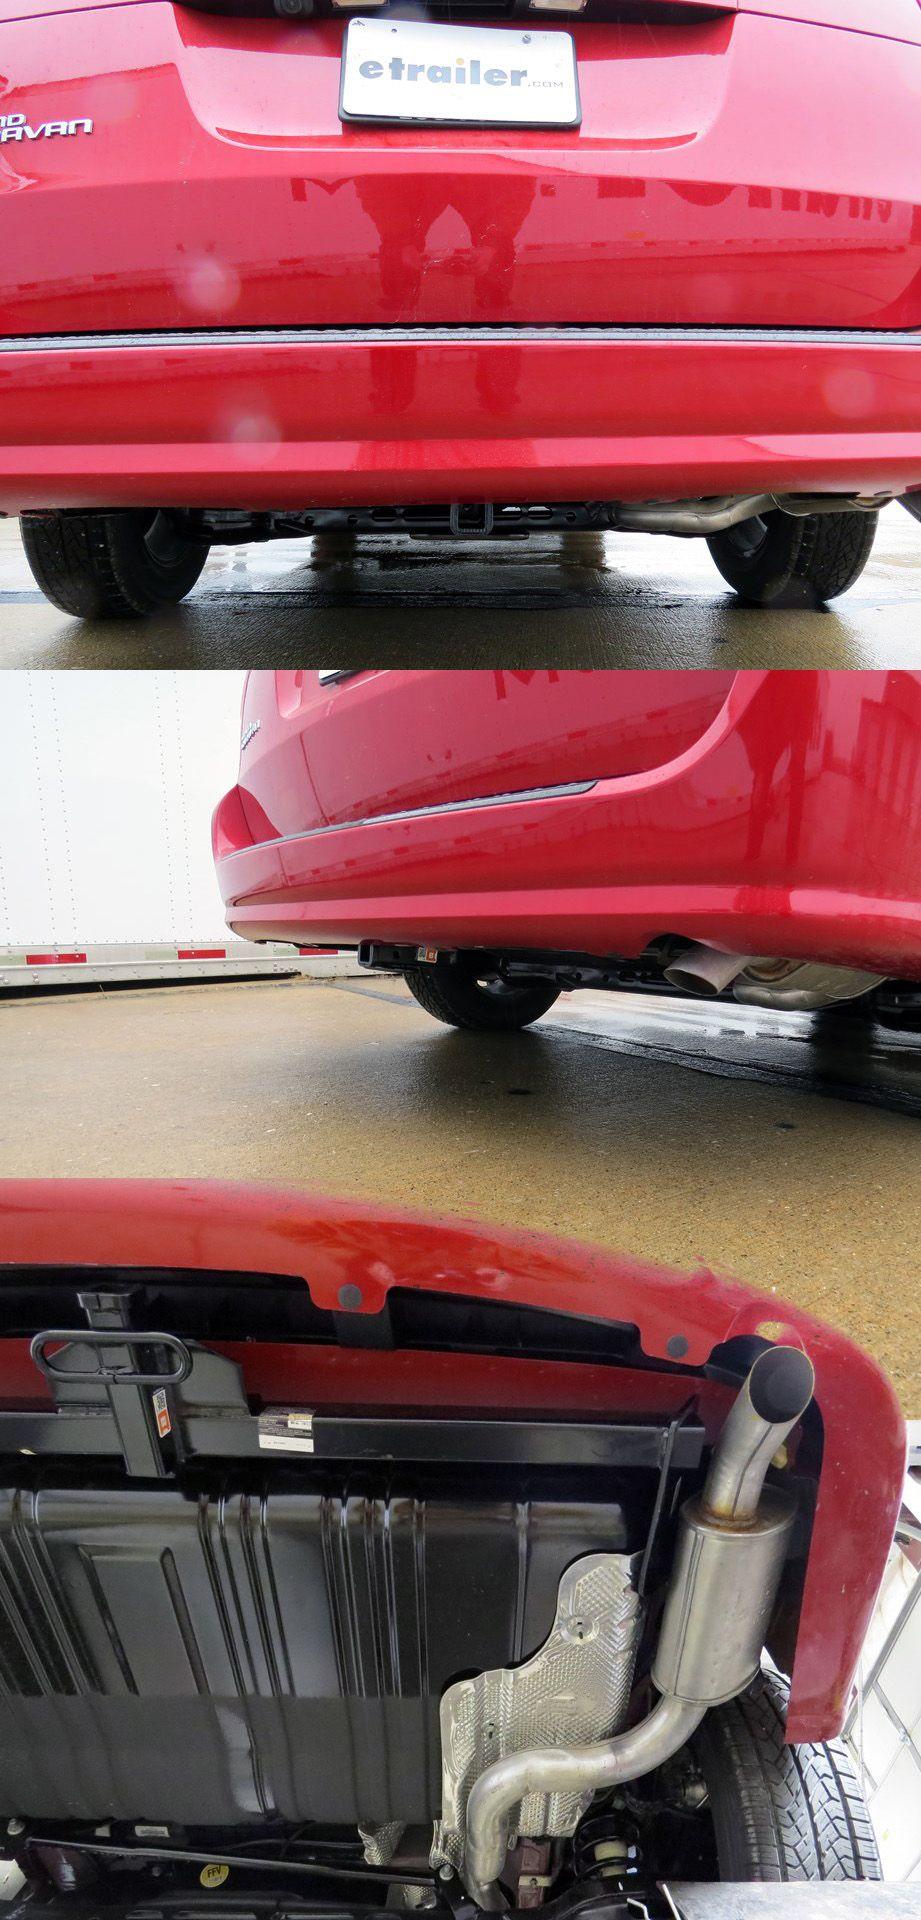 2015 Dodge Grand Caravan Trailer Hitch Draw Tite Grand Caravan Trailer Hitch Trailer Hitch Installation